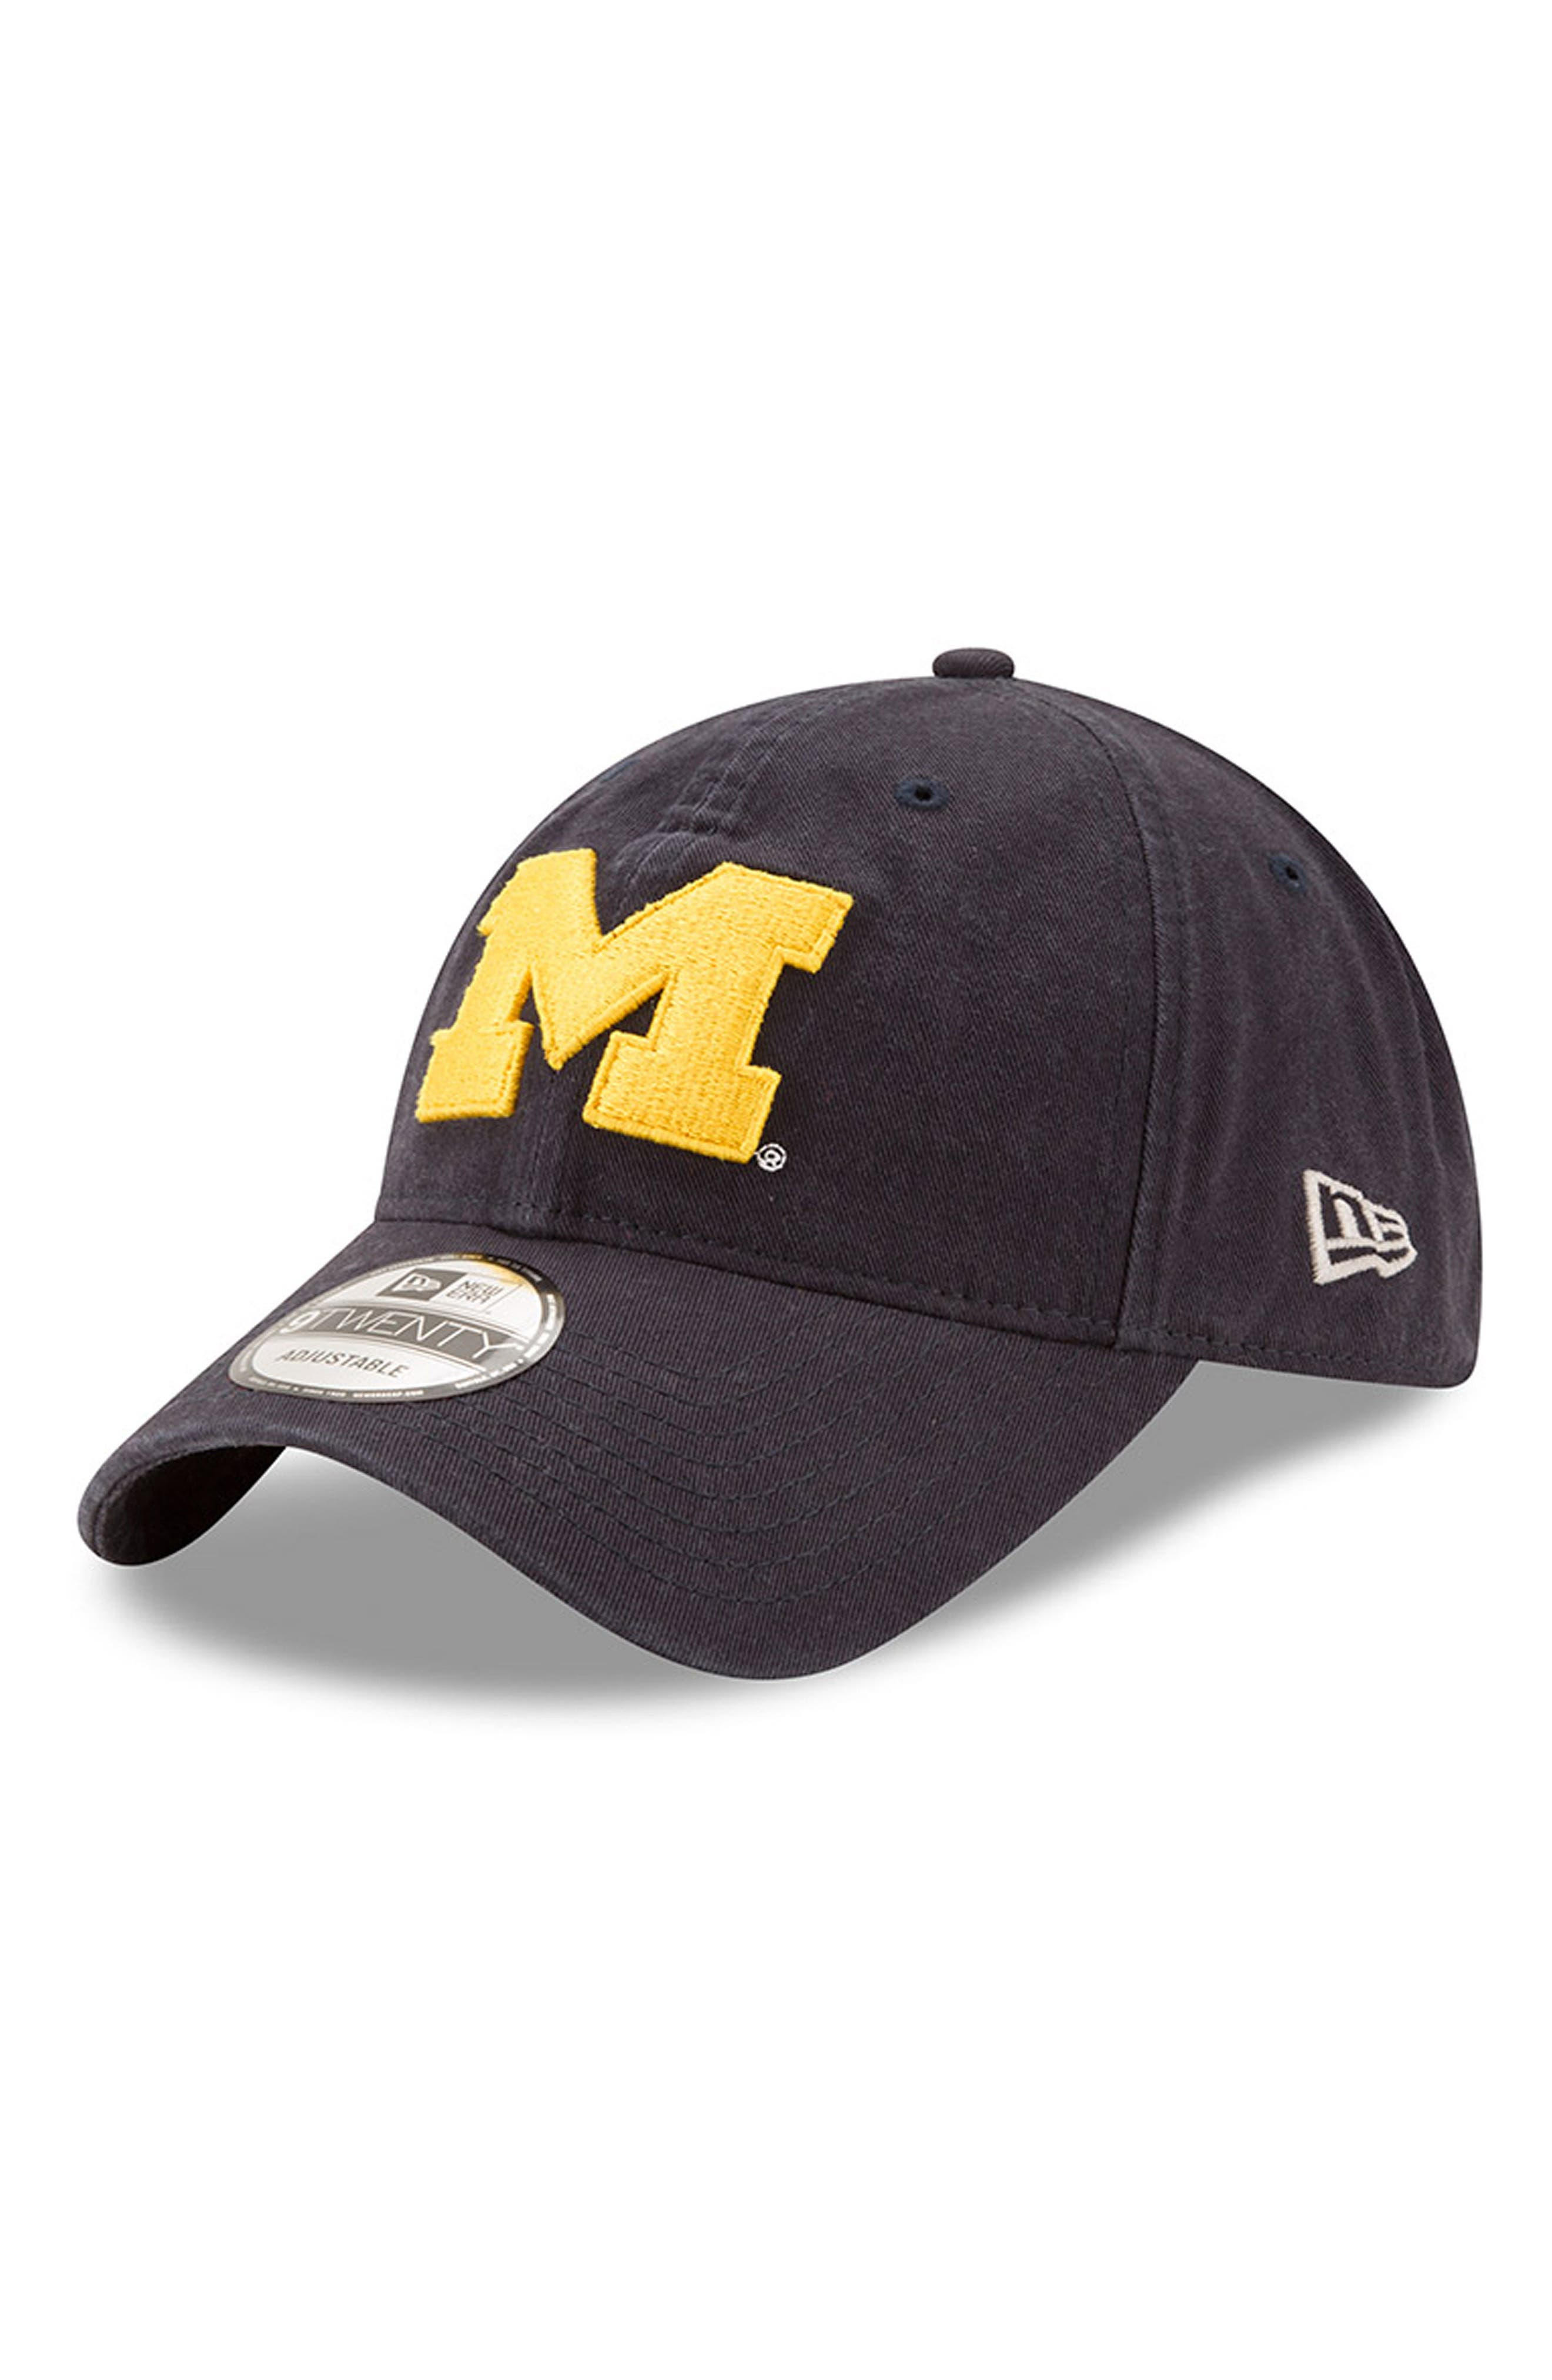 New Era Collegiate Core Classic - Michigan Wolverines Baseball Cap,                             Main thumbnail 1, color,                             410